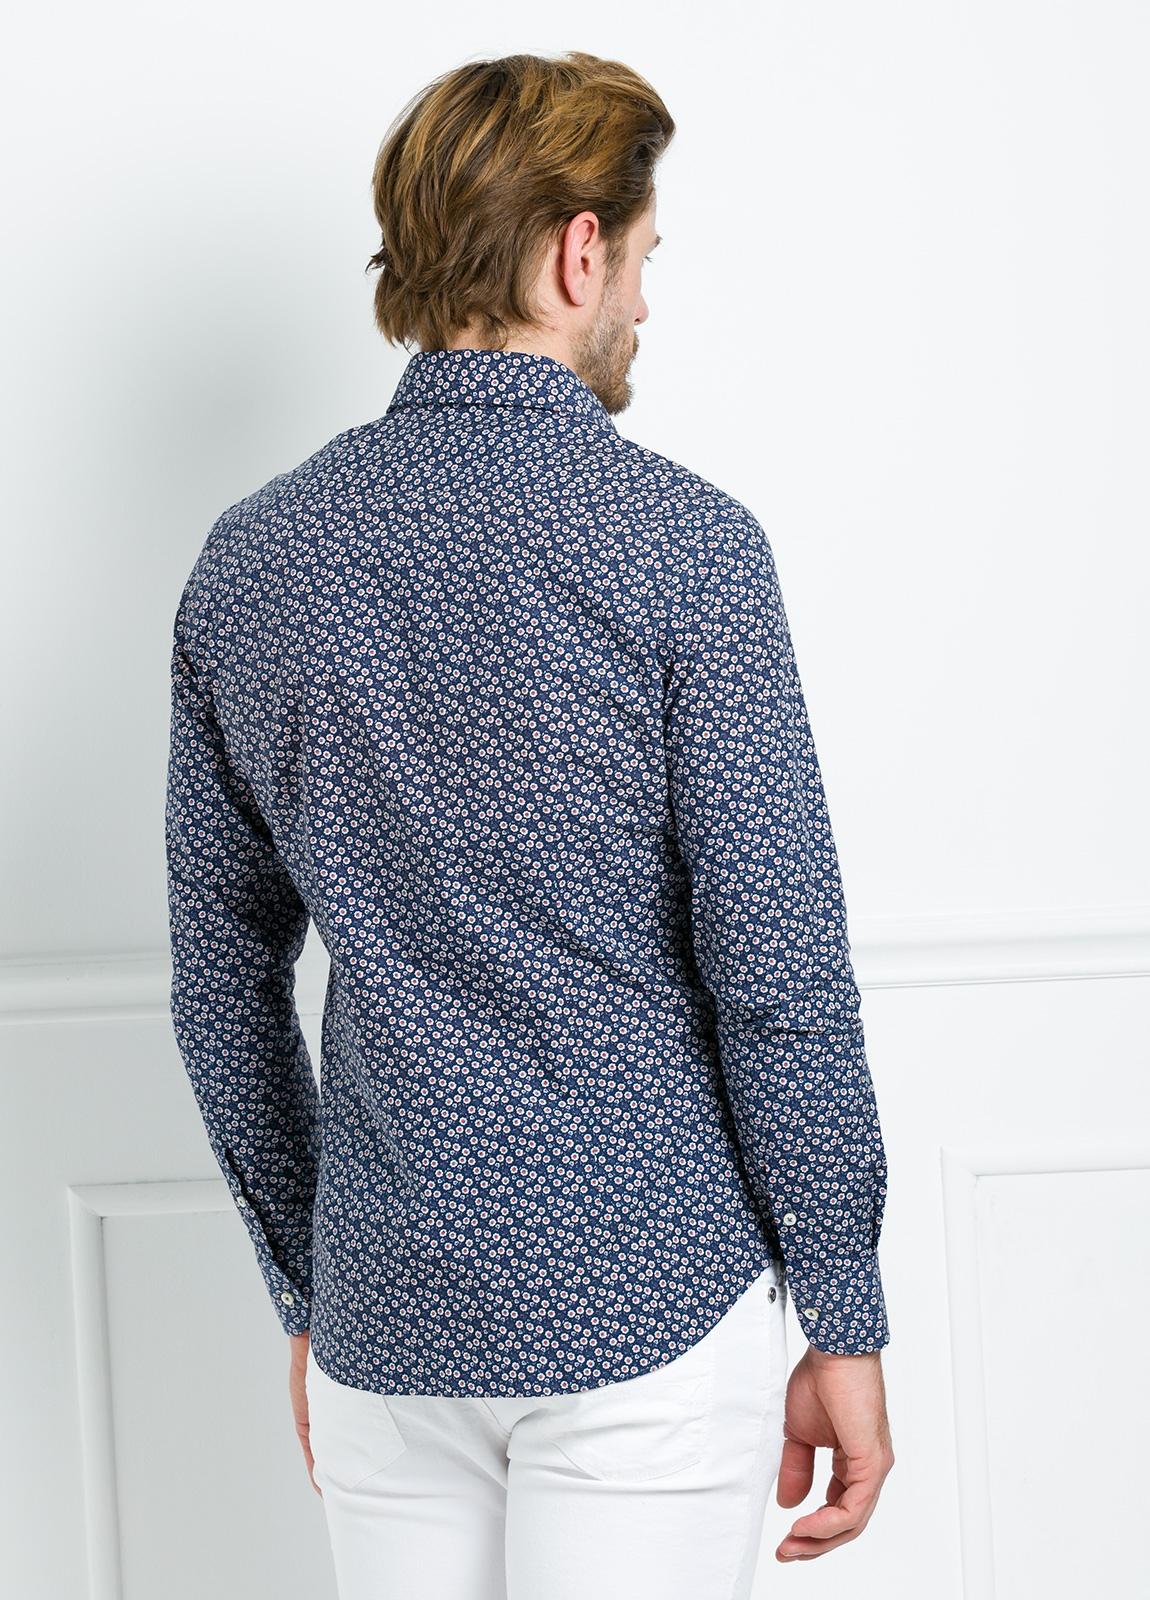 Camisa Leisure Wear SLIM FIT modelo PORTO estampado floral color azul marino. 100% Algodón. - Ítem3